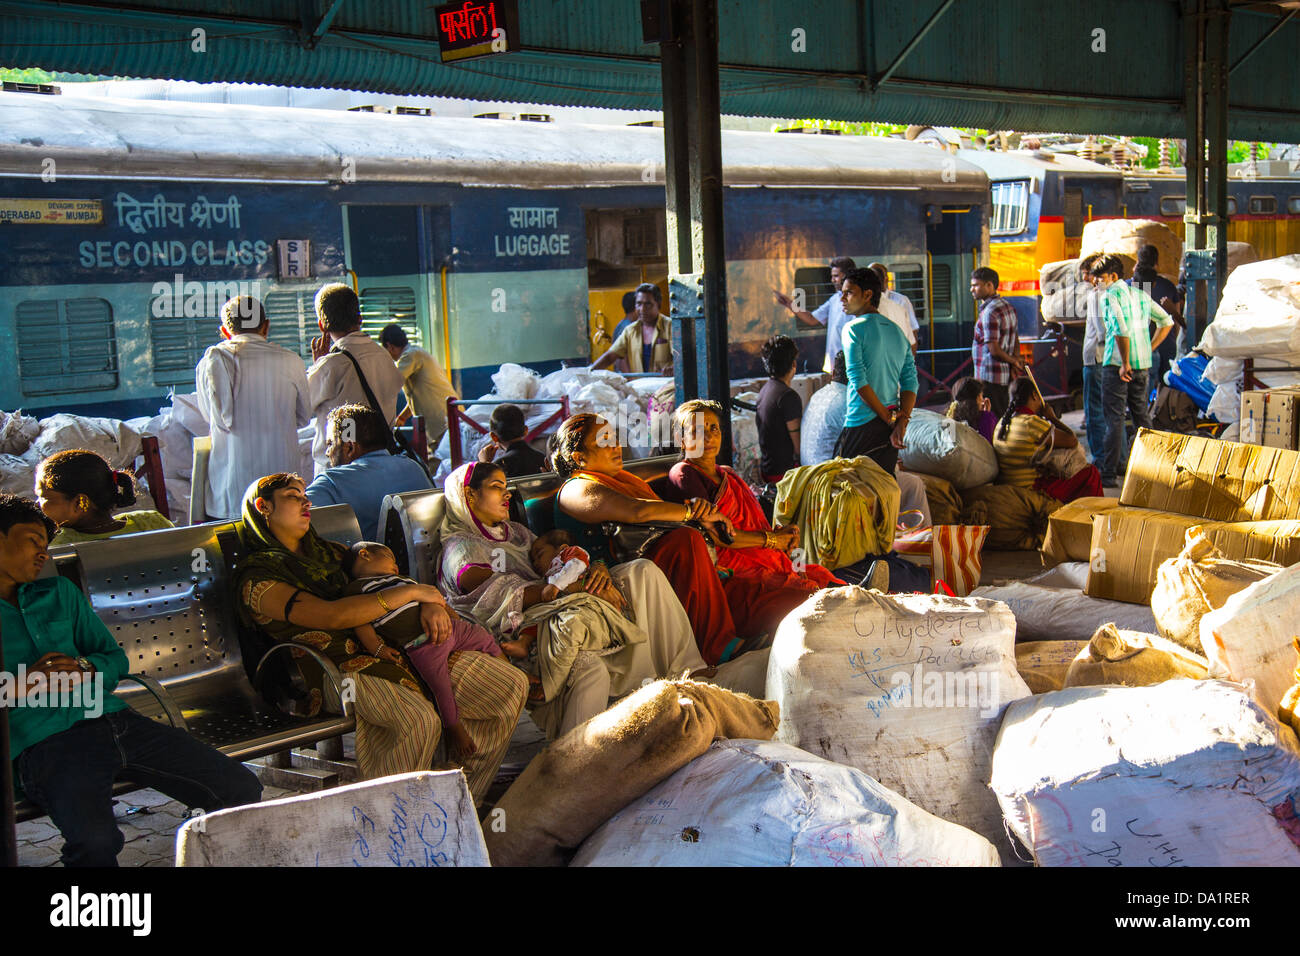 Plate-forme bondée en Chattrapati Shivaji Terminus ou Victoria, Mumbai, Inde Photo Stock